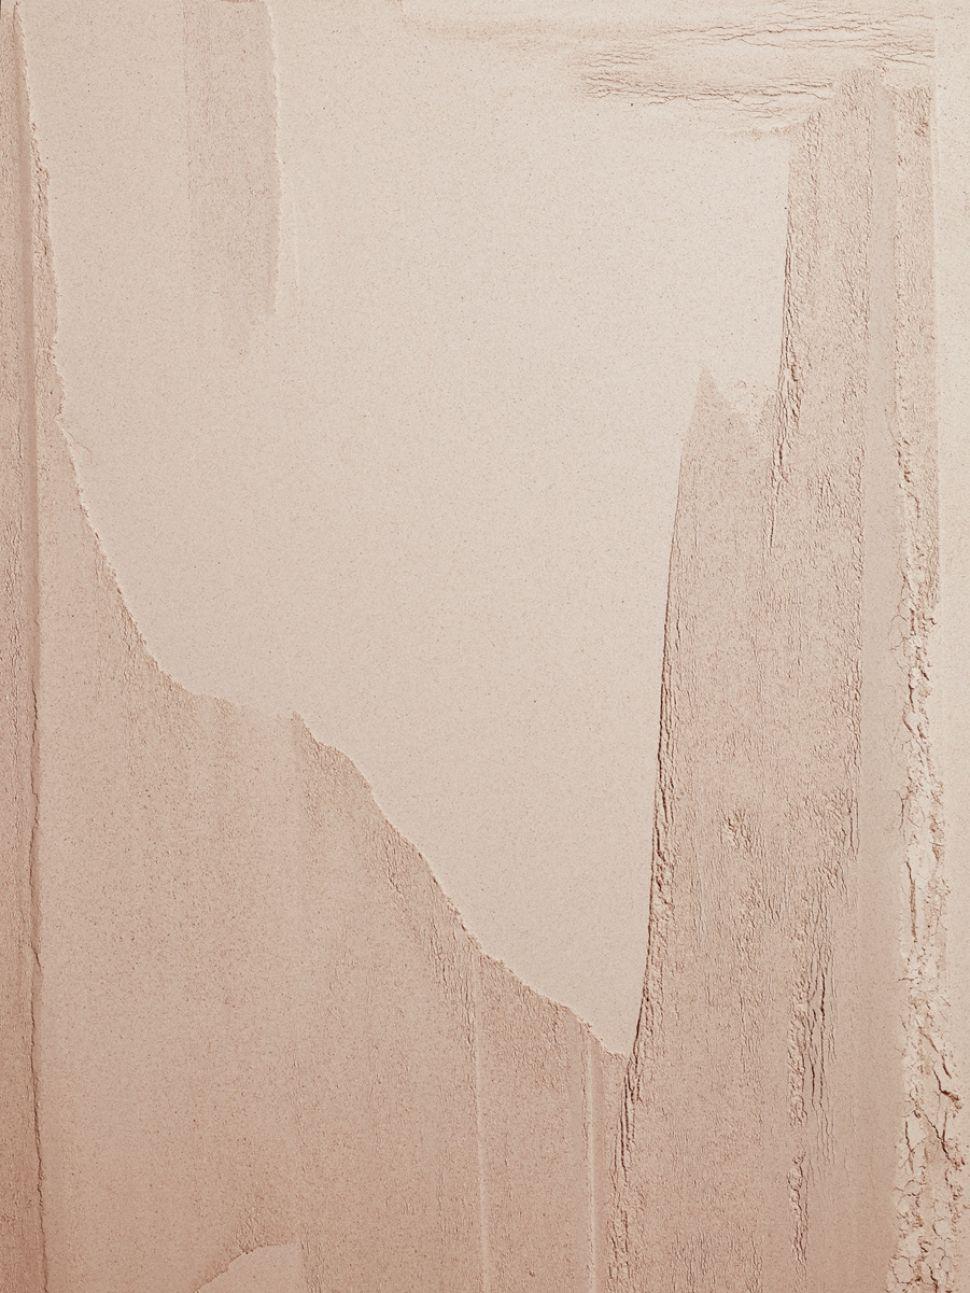 "Texture Carrelage Moderne Inspirant Galerie Thér¨se Verrat ""pos Beauty Pinterest"